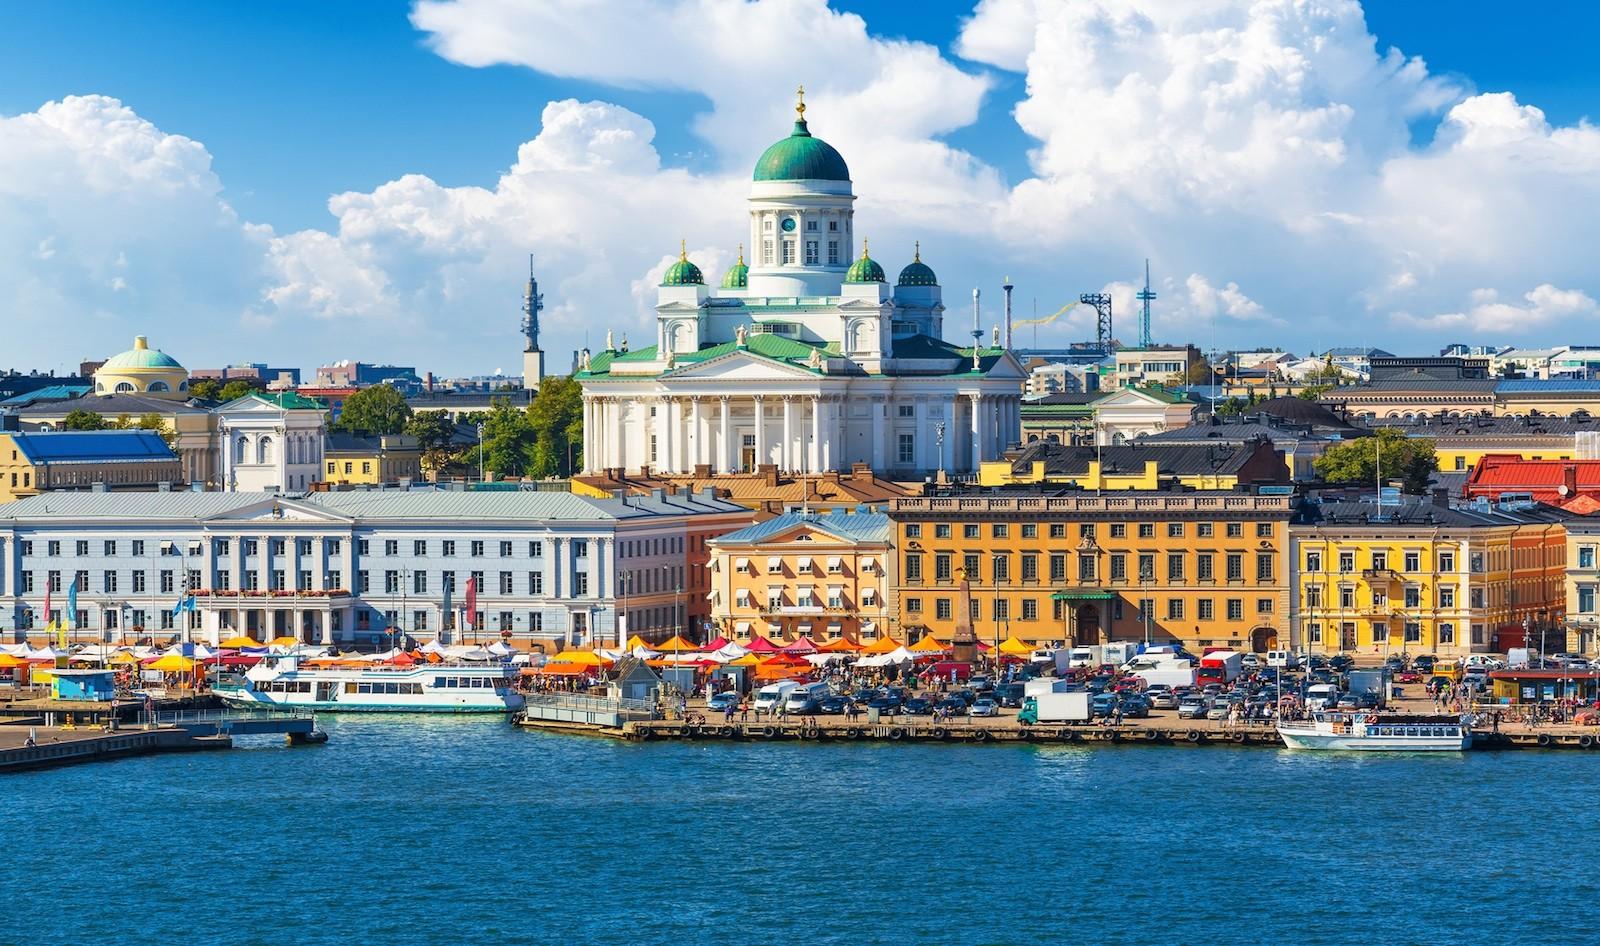 Michael Sorkin On 'The Next Helsinki' Competition, Helsinki Waterfront. ImageCourtesy Laura Brewis